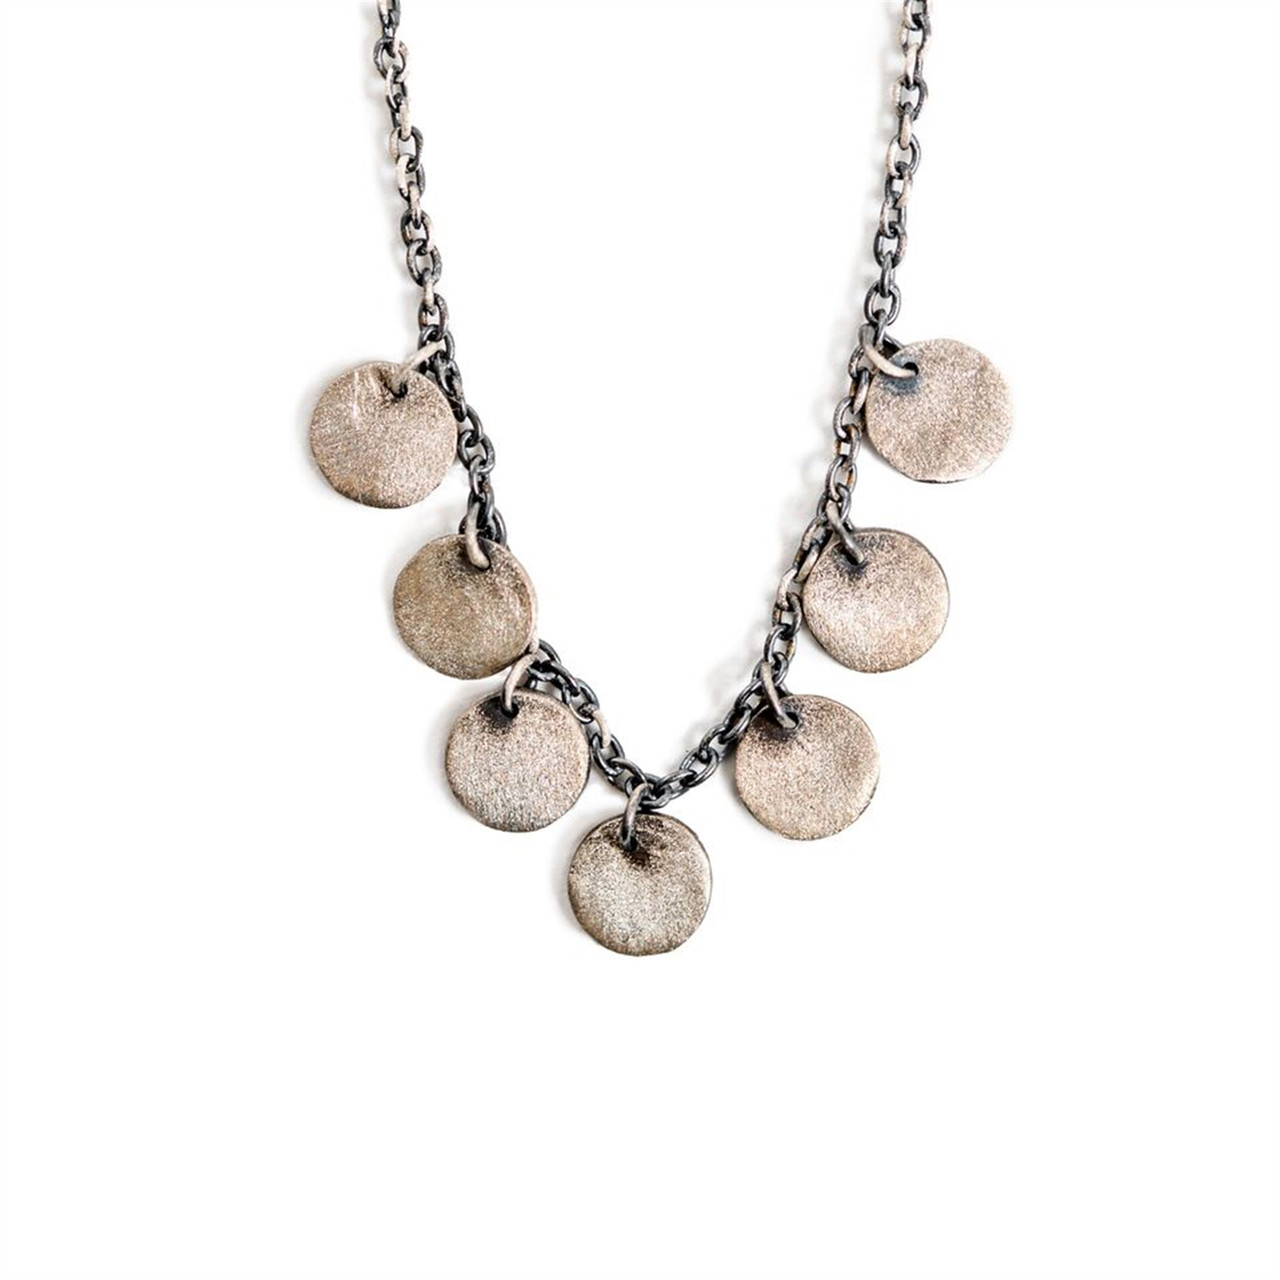 Coin Necklace #4